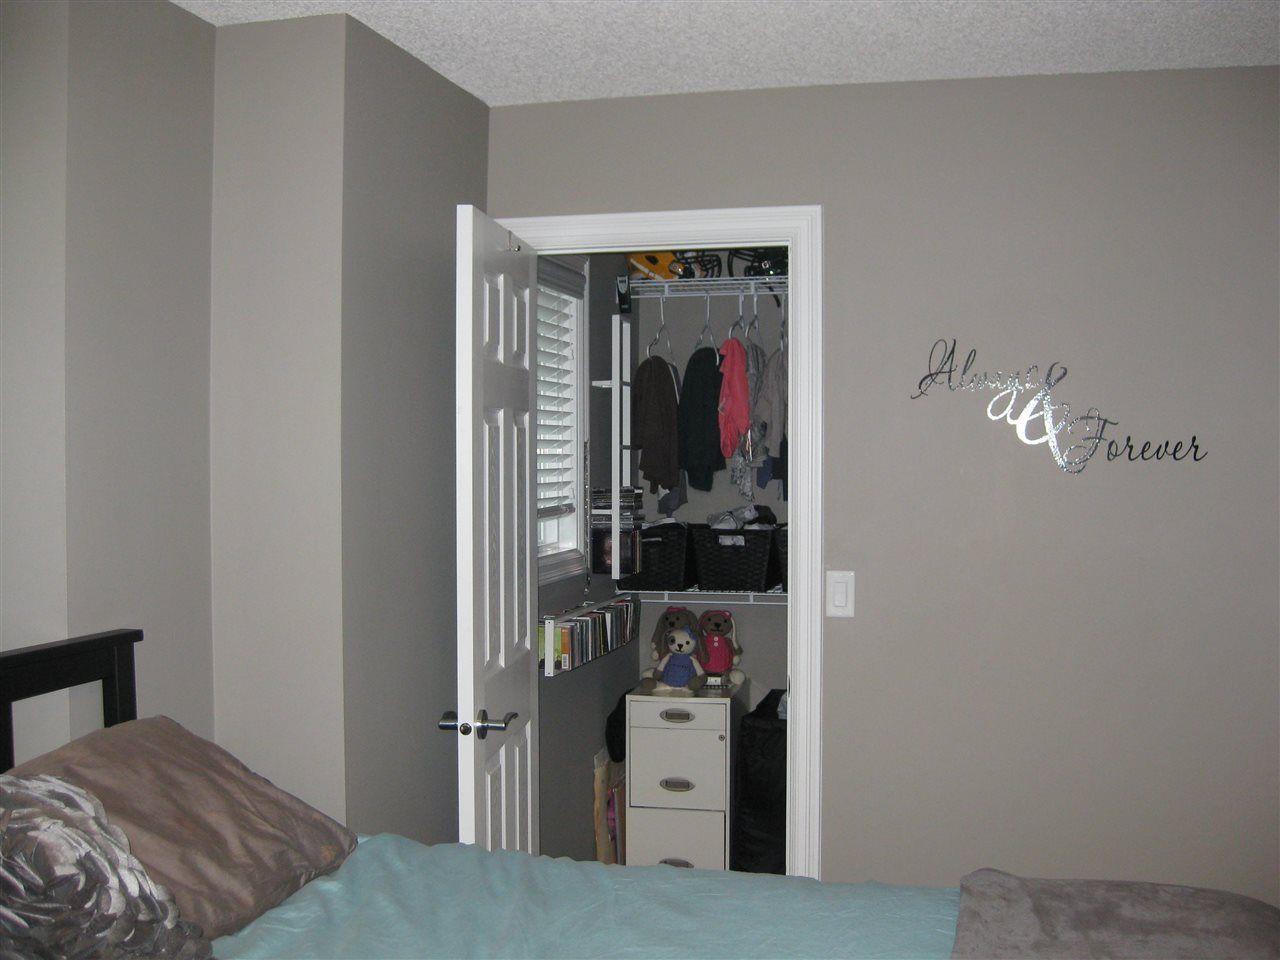 Photo 17: Photos: #41 3625 144 AV NW in Edmonton: Zone 35 Townhouse for sale : MLS®# E4016087